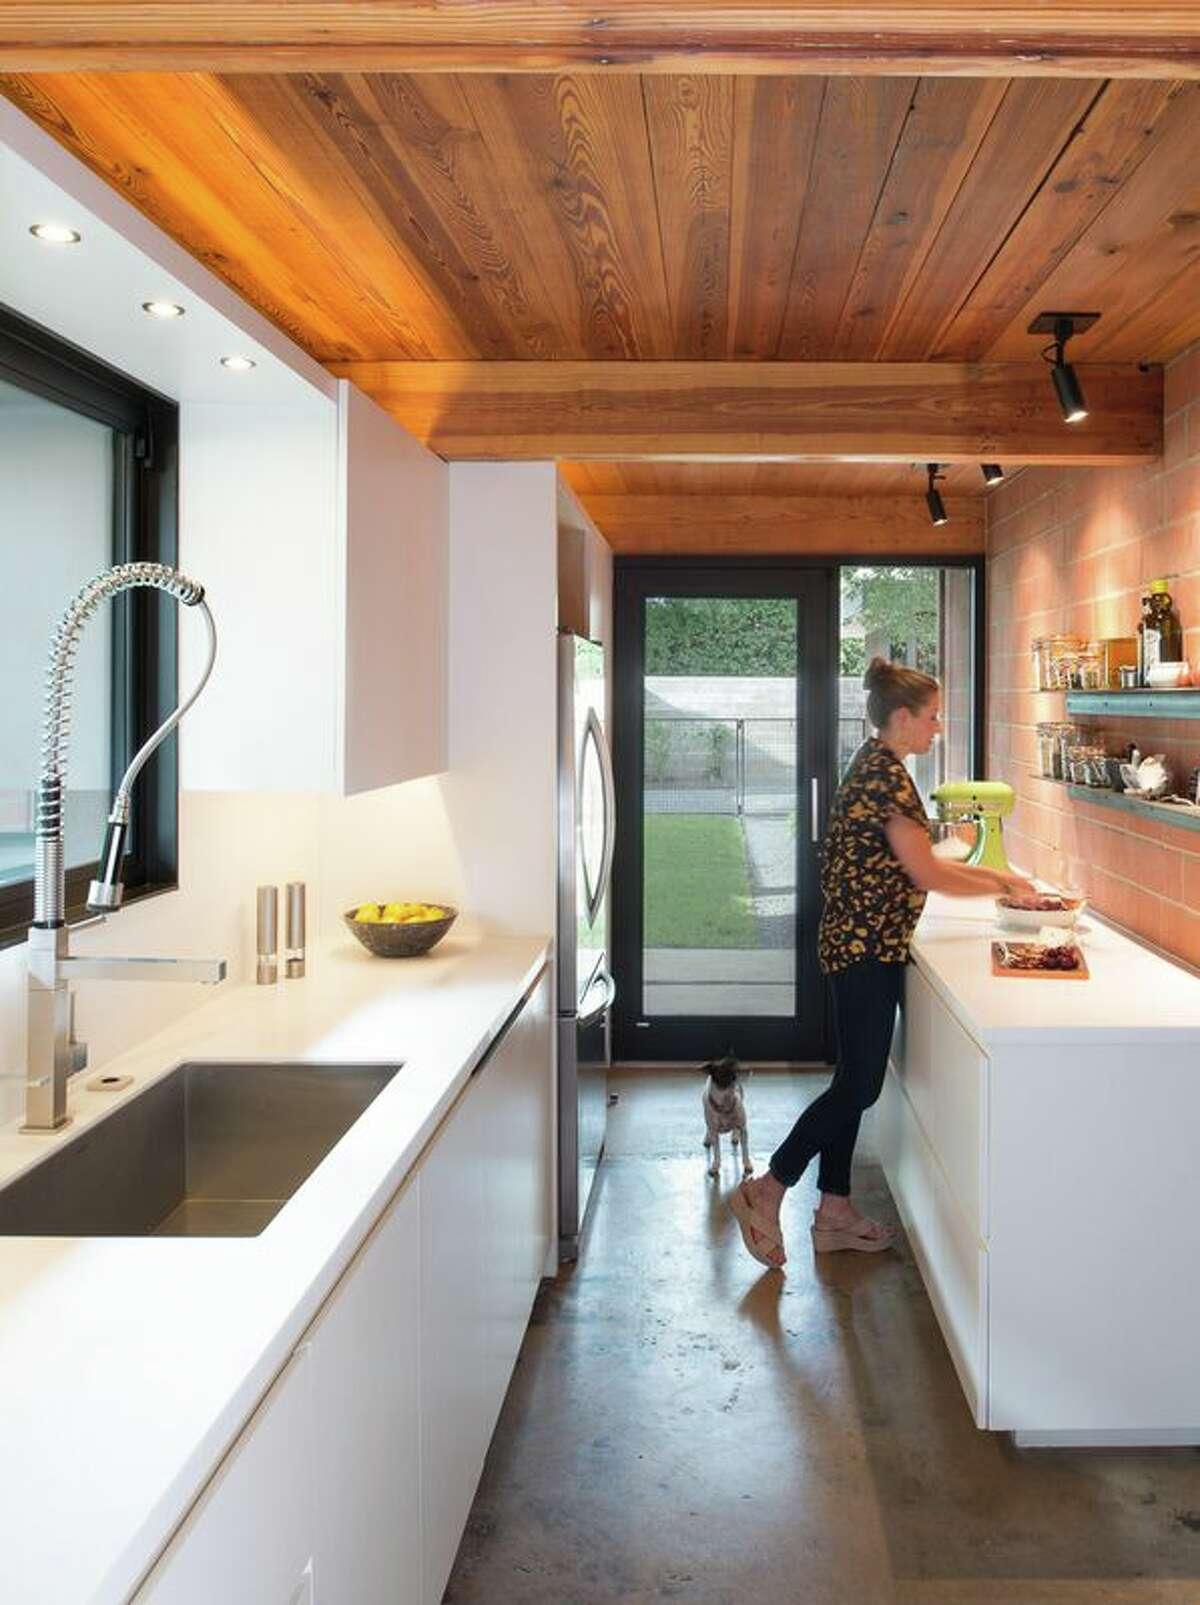 Courtney Smith in the kitchen.